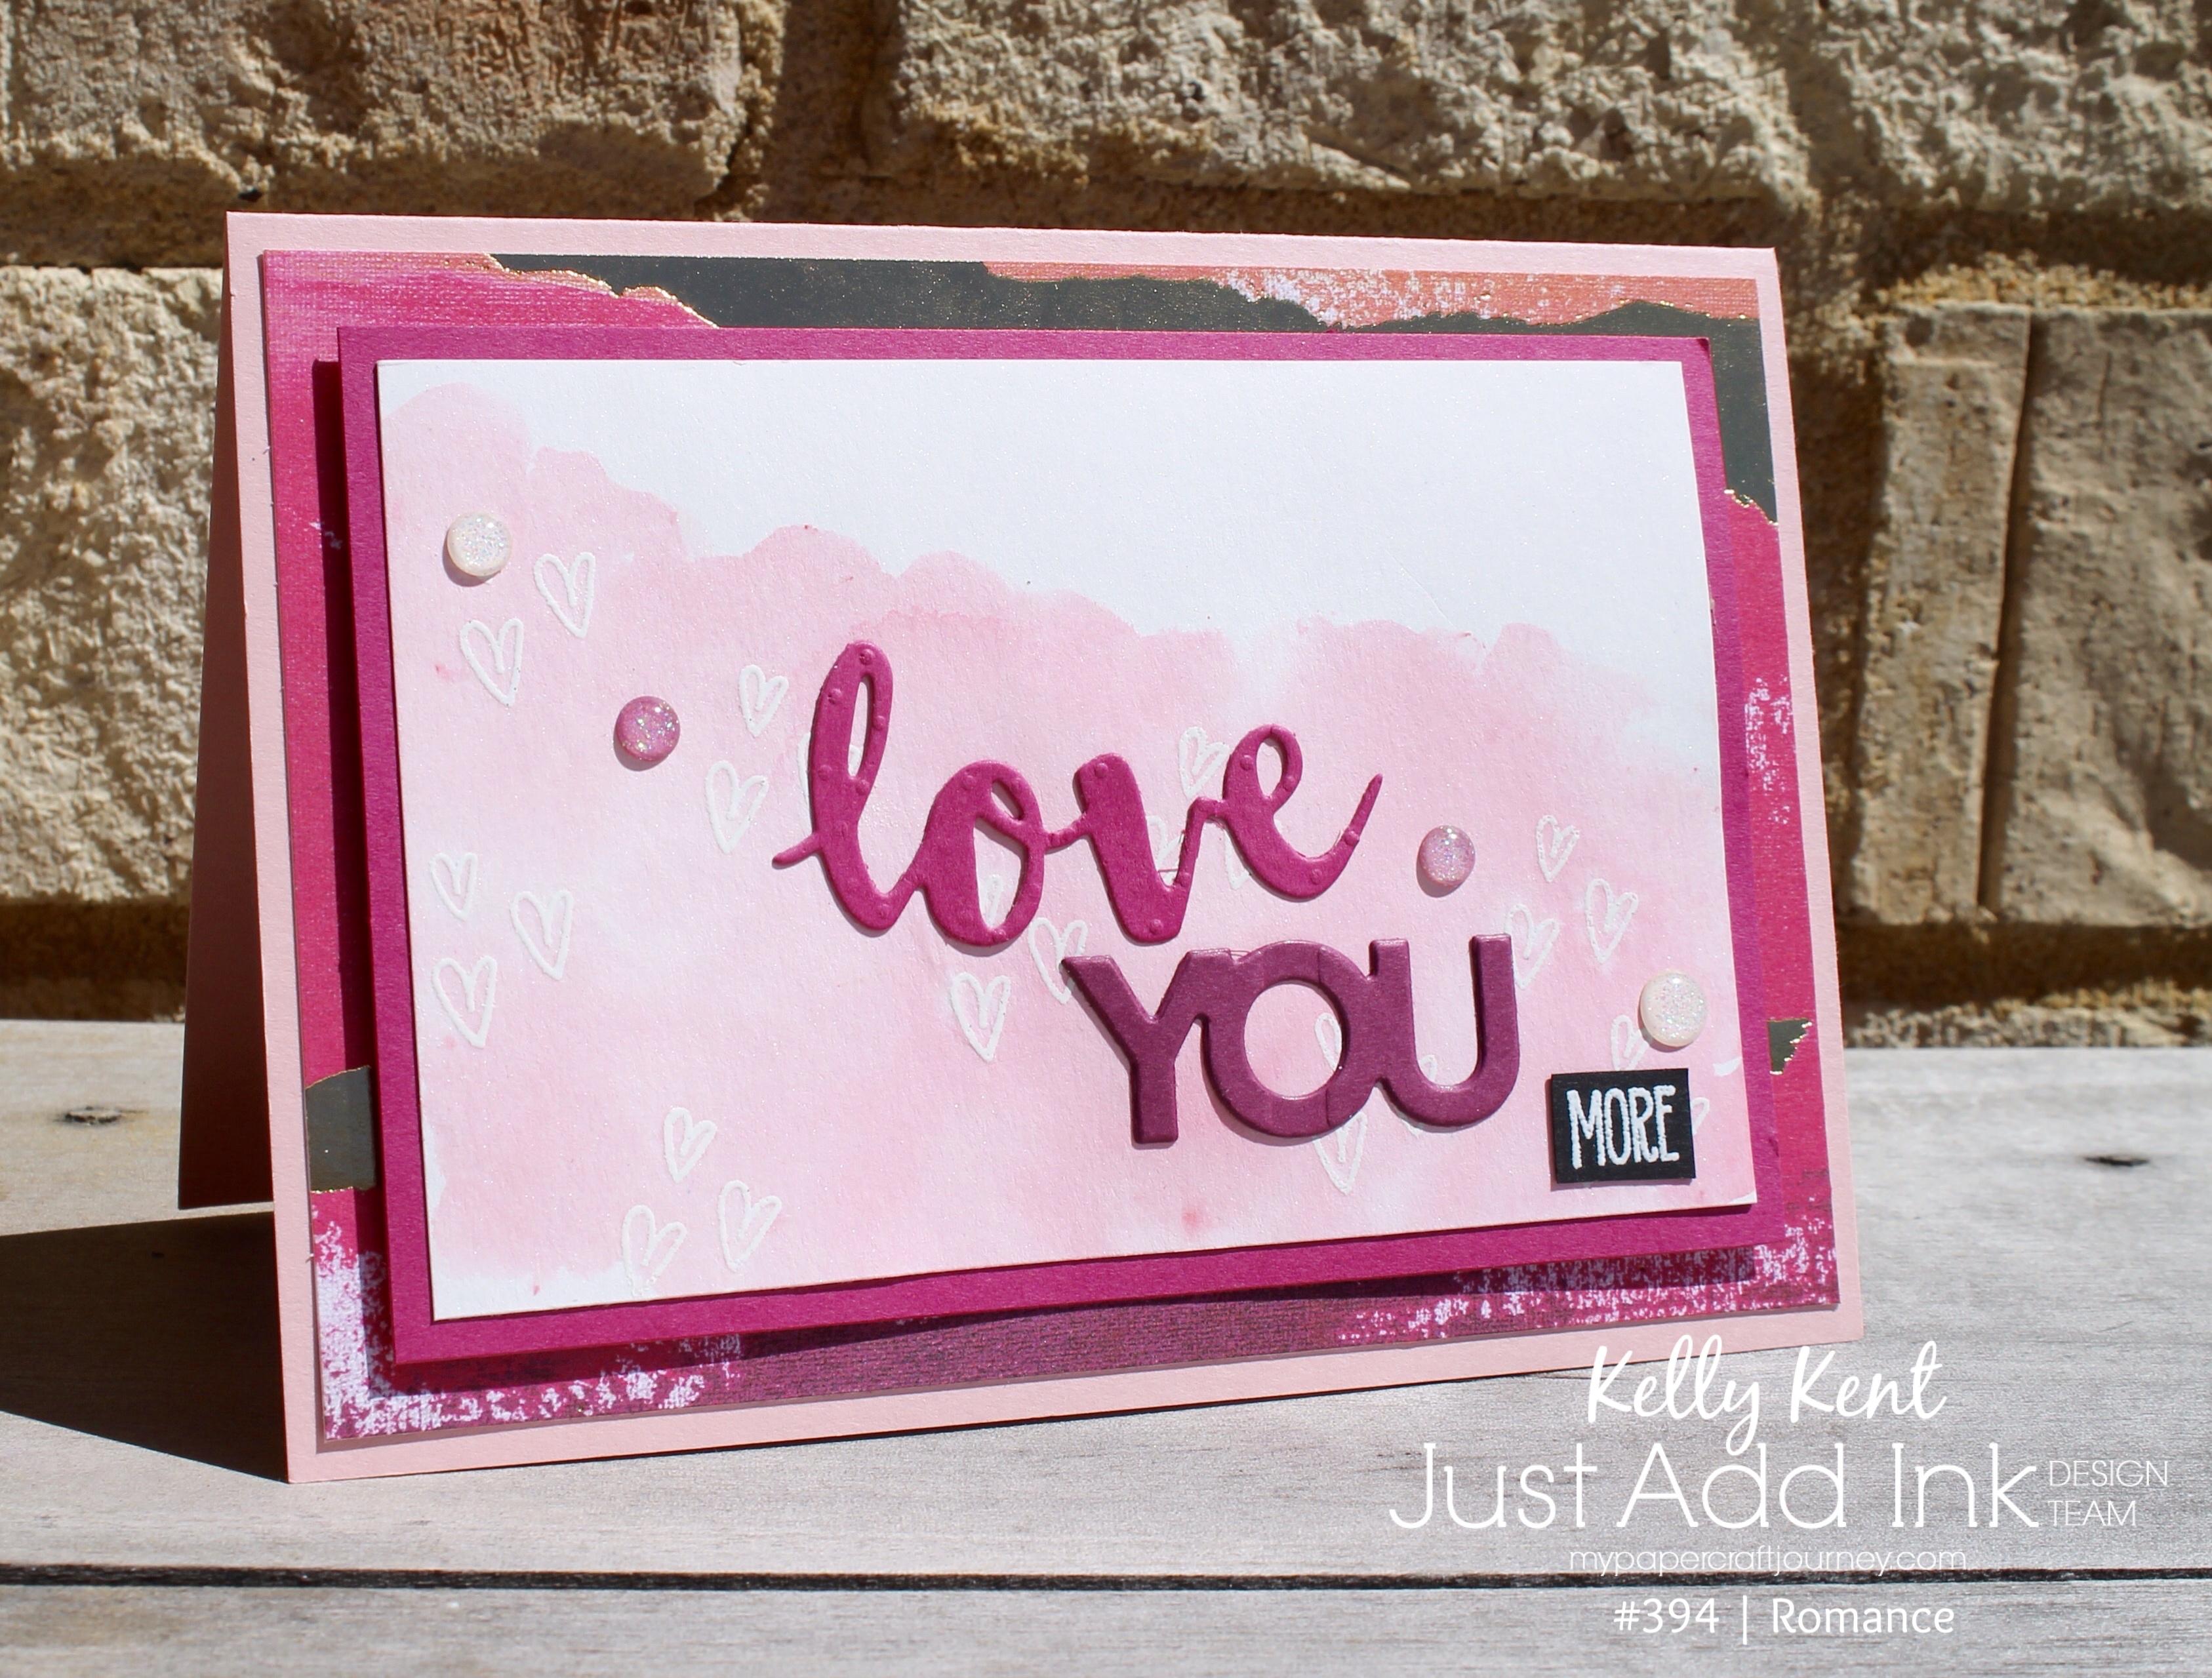 Just Add Ink #394 Romance | kelly kent